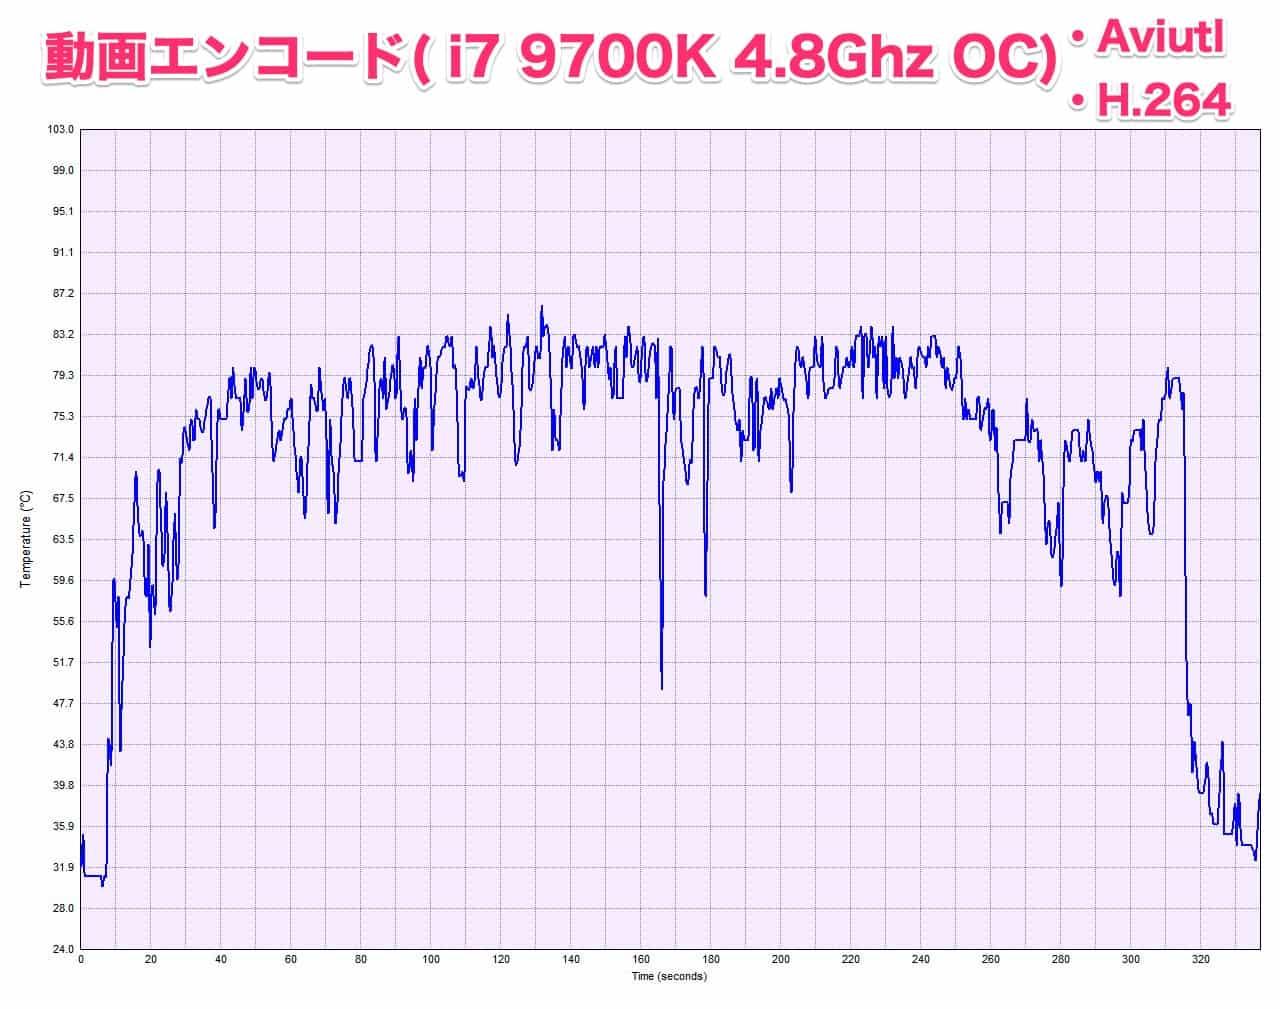 aviutl-h.264-i7-9700k-OC-4.8Ghz